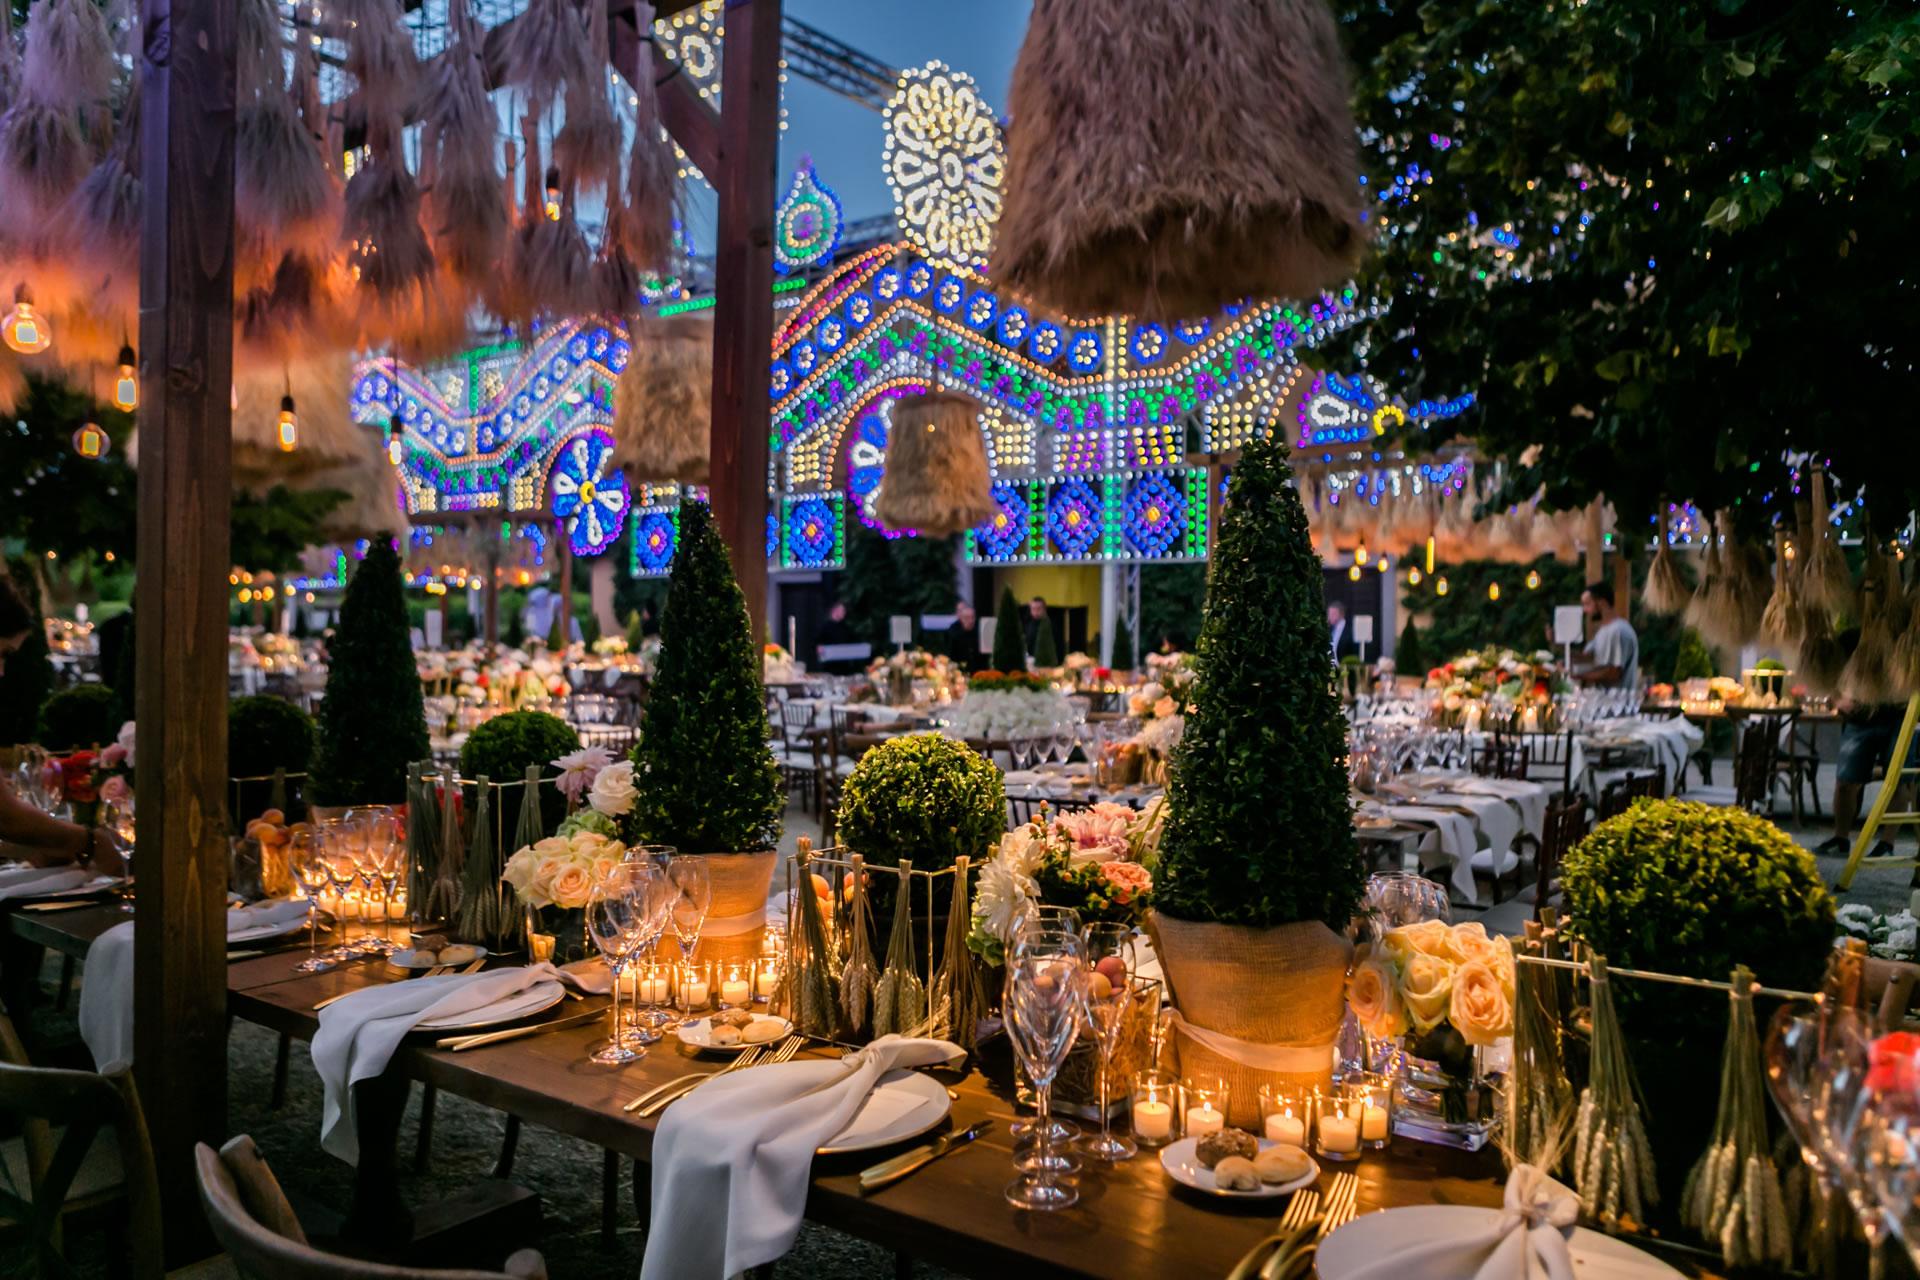 Cypresses - 55 :: Luxury wedding at Il Borro :: Luxury wedding photography - 54 :: Cypresses - 55